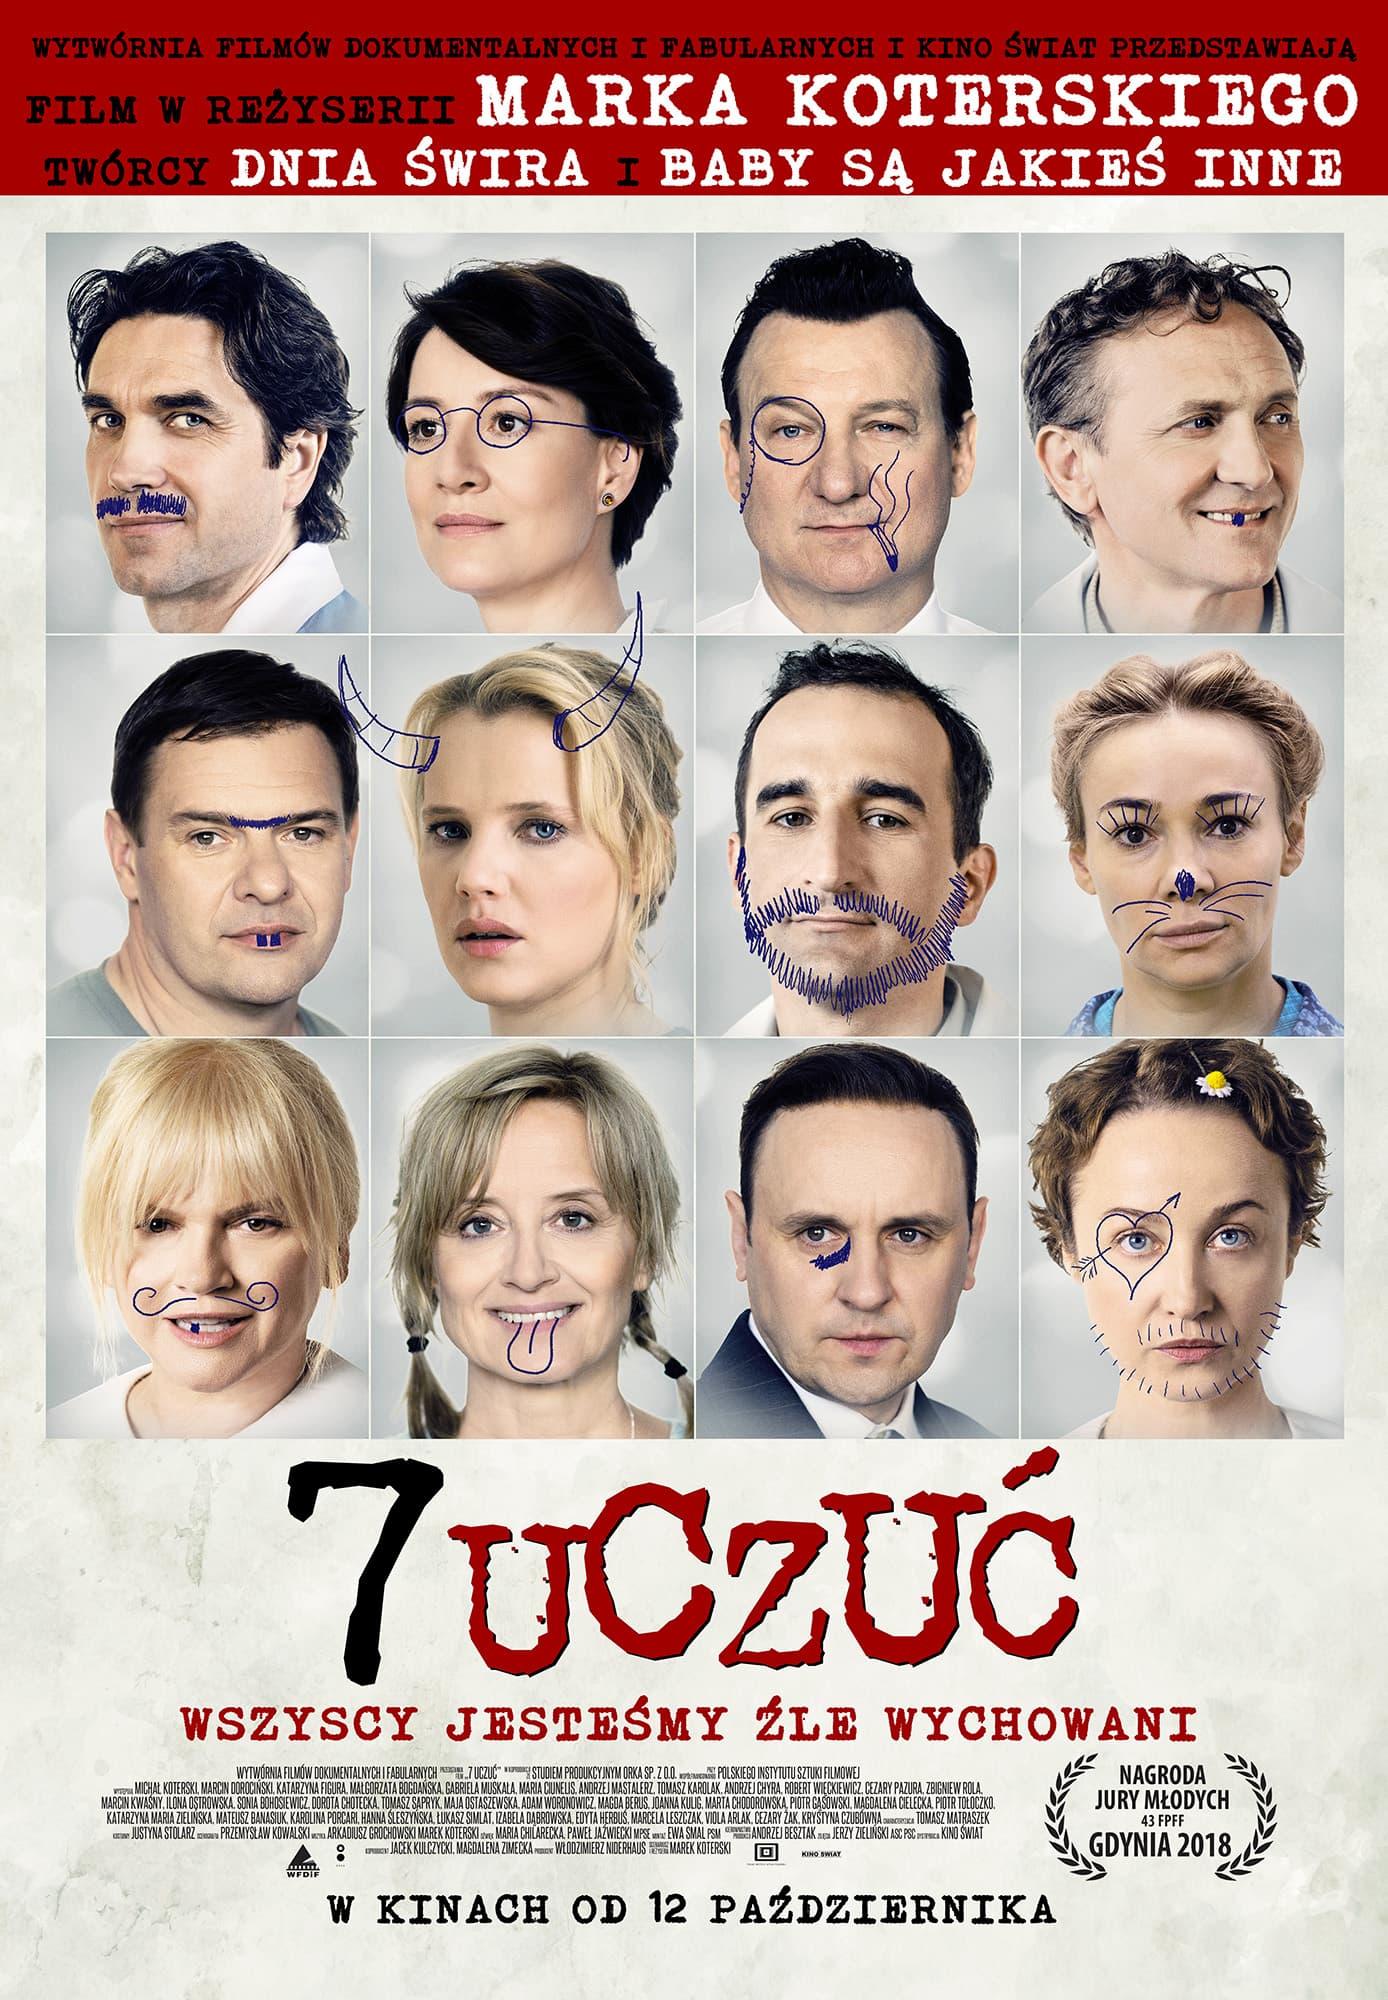 7 uczuć plakat